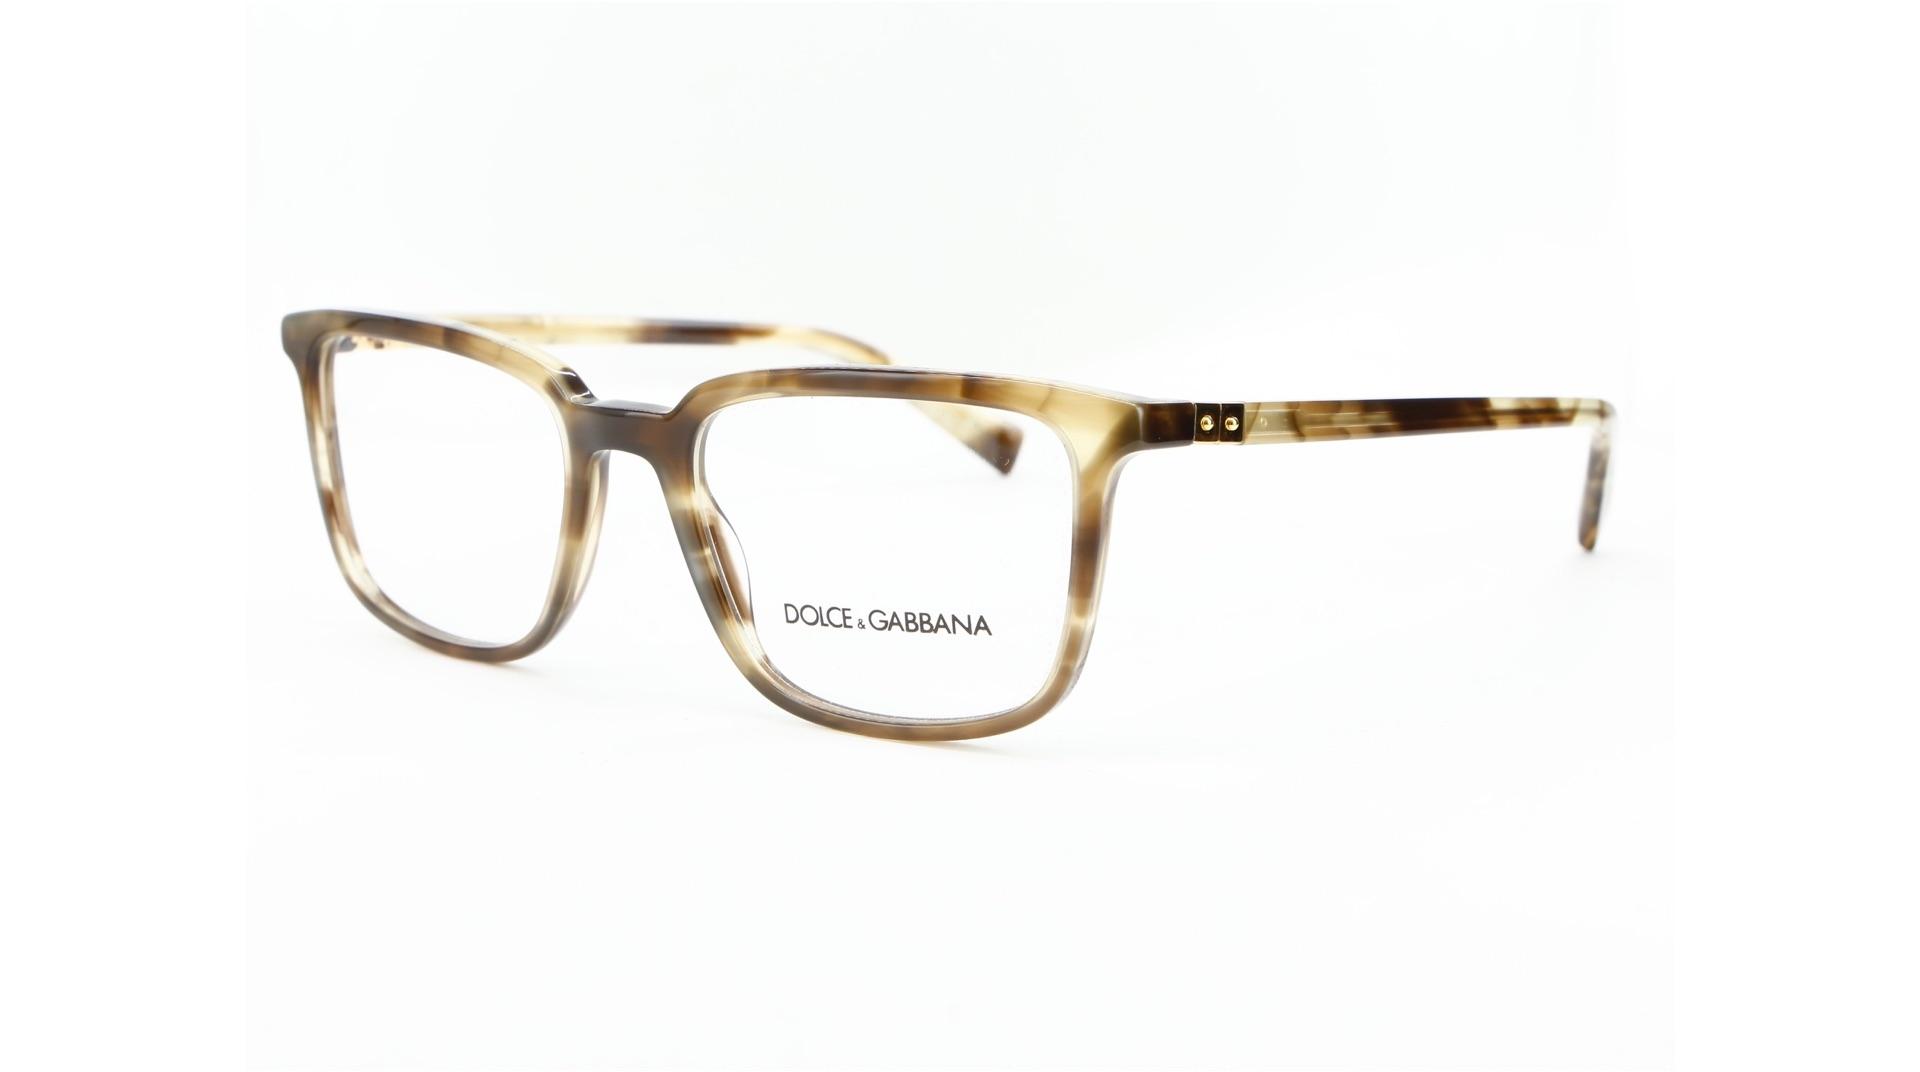 Dolce & Gabbana - ref: 80745